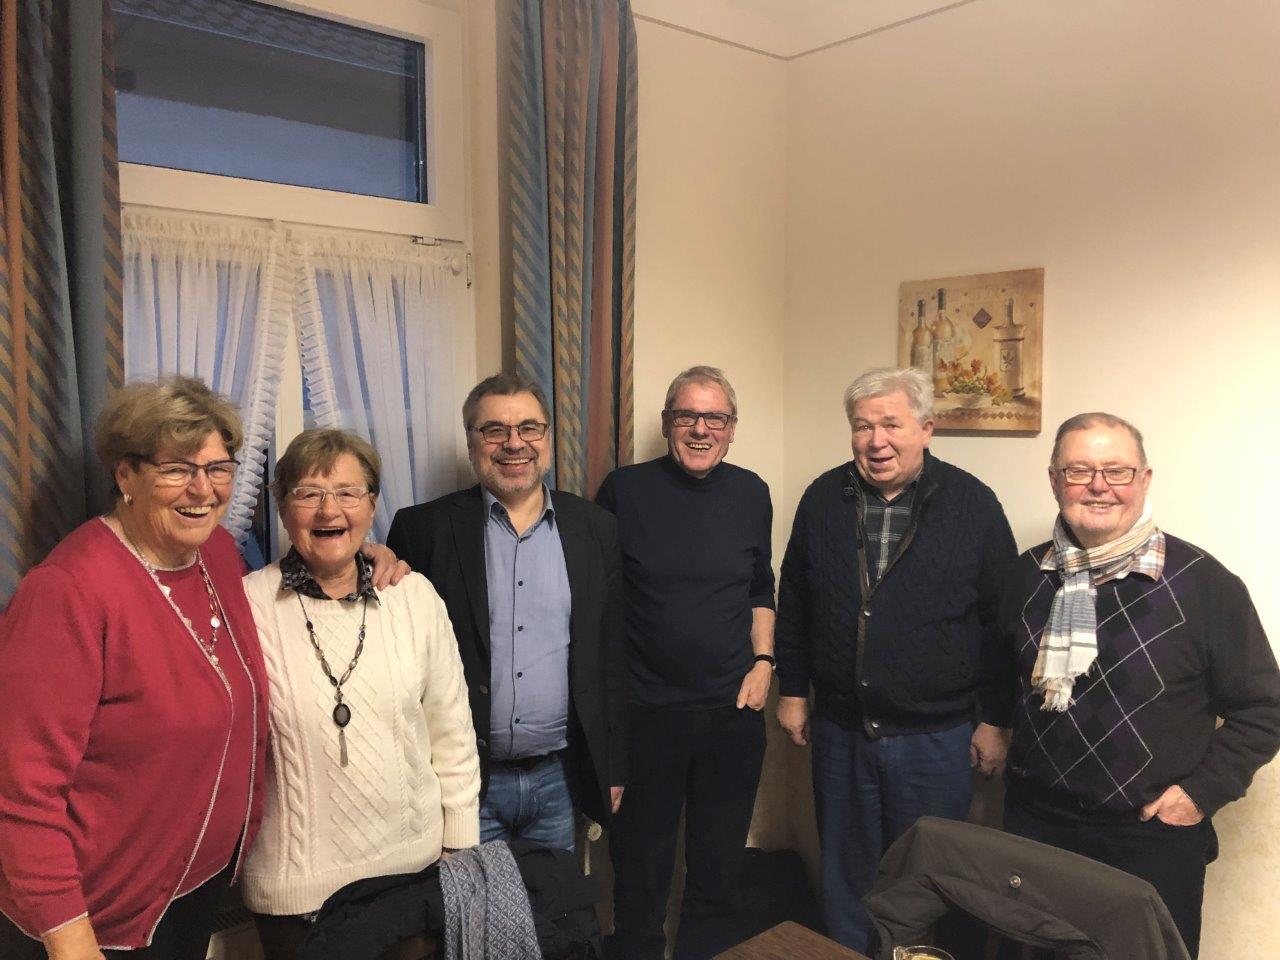 (v.l.) Lydia Kellmann, Gisela Dubrau, Volker Marquard, Siegmund Braune, Karlheinz Dvorak, Horst Dubrau